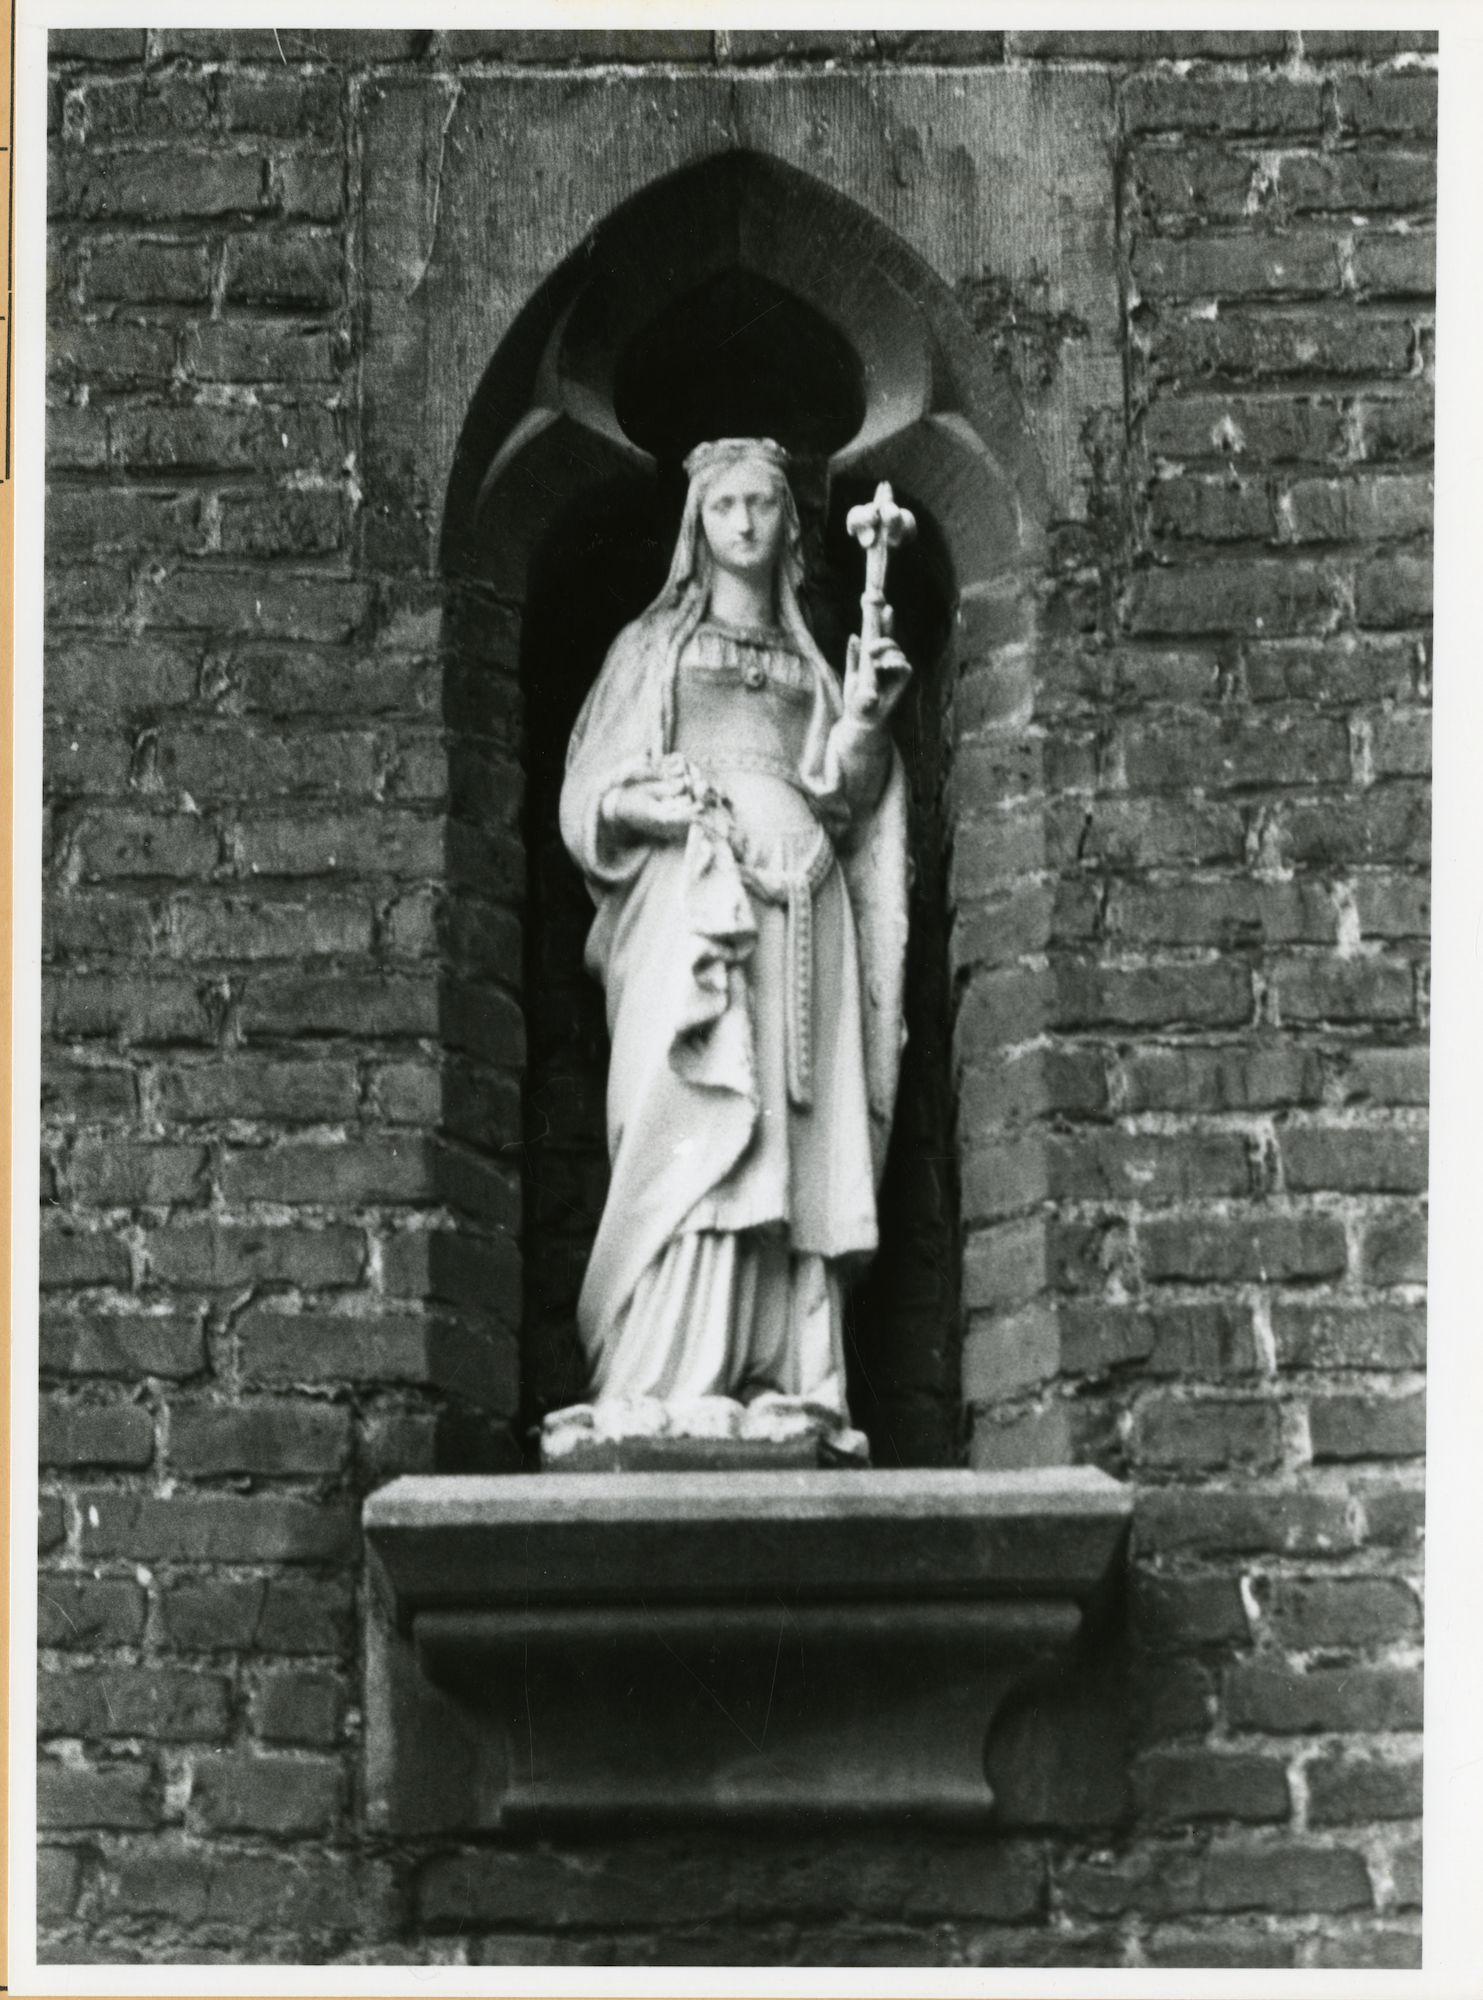 Gent: Keizervest 5: Gevelbeeld, 1979